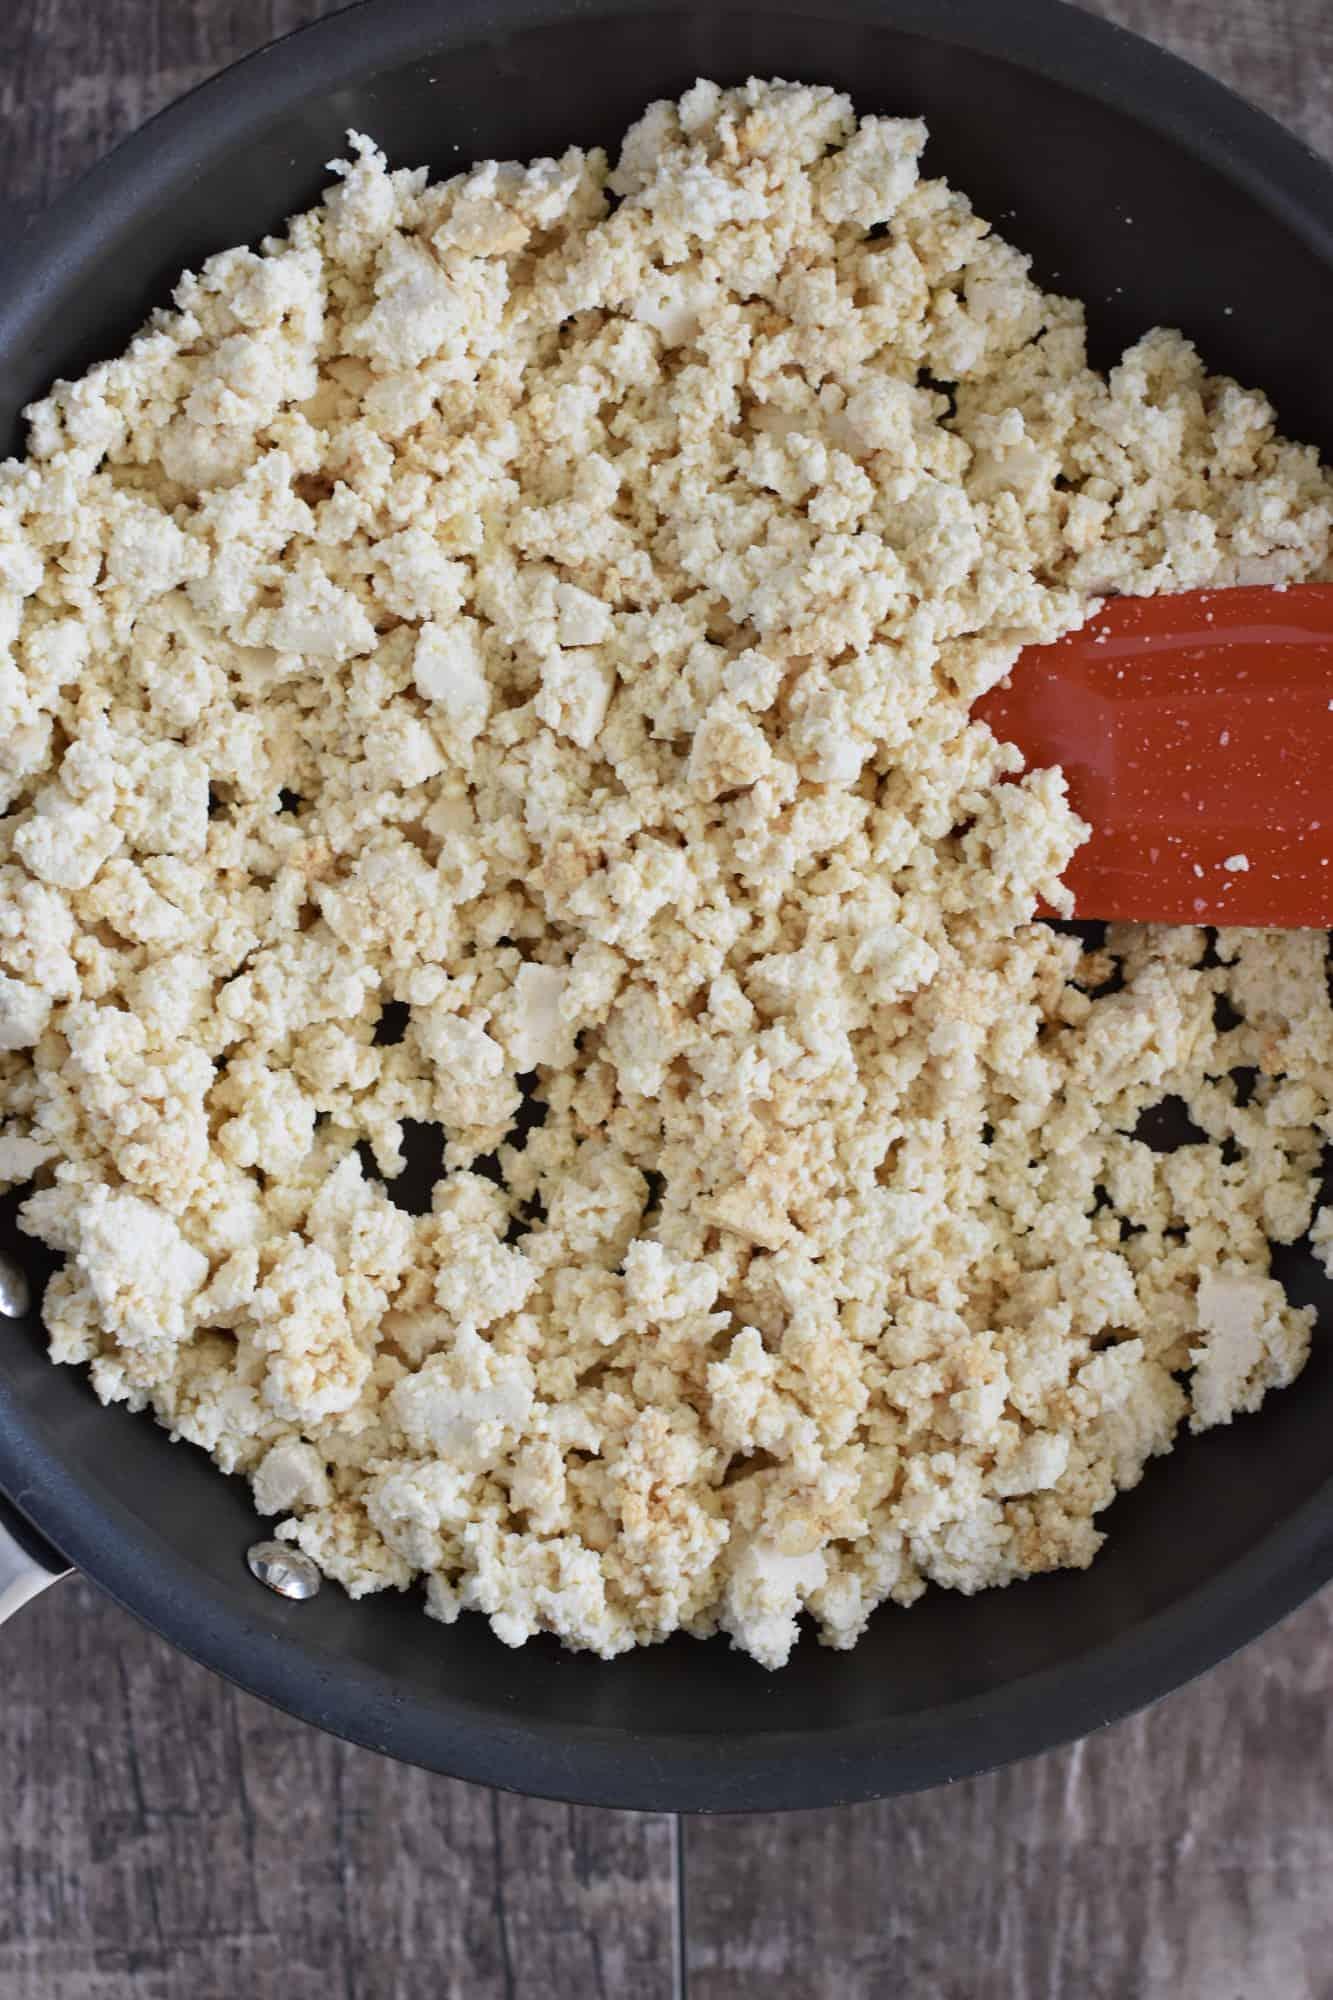 stirring the tamari into the crumbled tofu